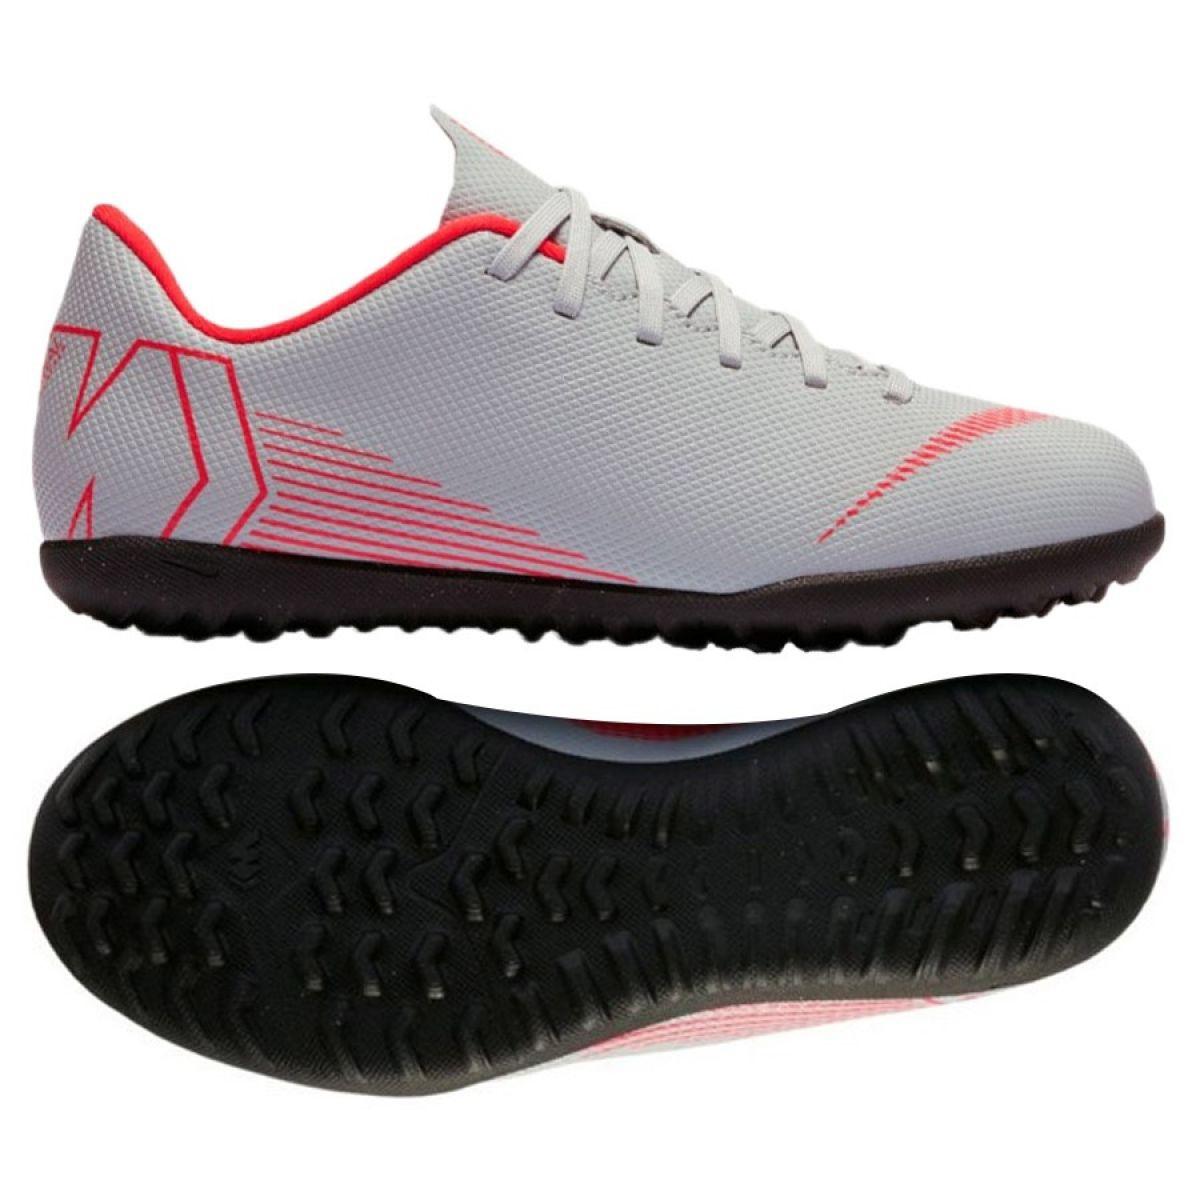 atravesar Normalización yermo  Nike Mercurial VaporX 12 club football shoes Tf Gs Jr AH7355-060 white  multicolored - ButyModne.pl